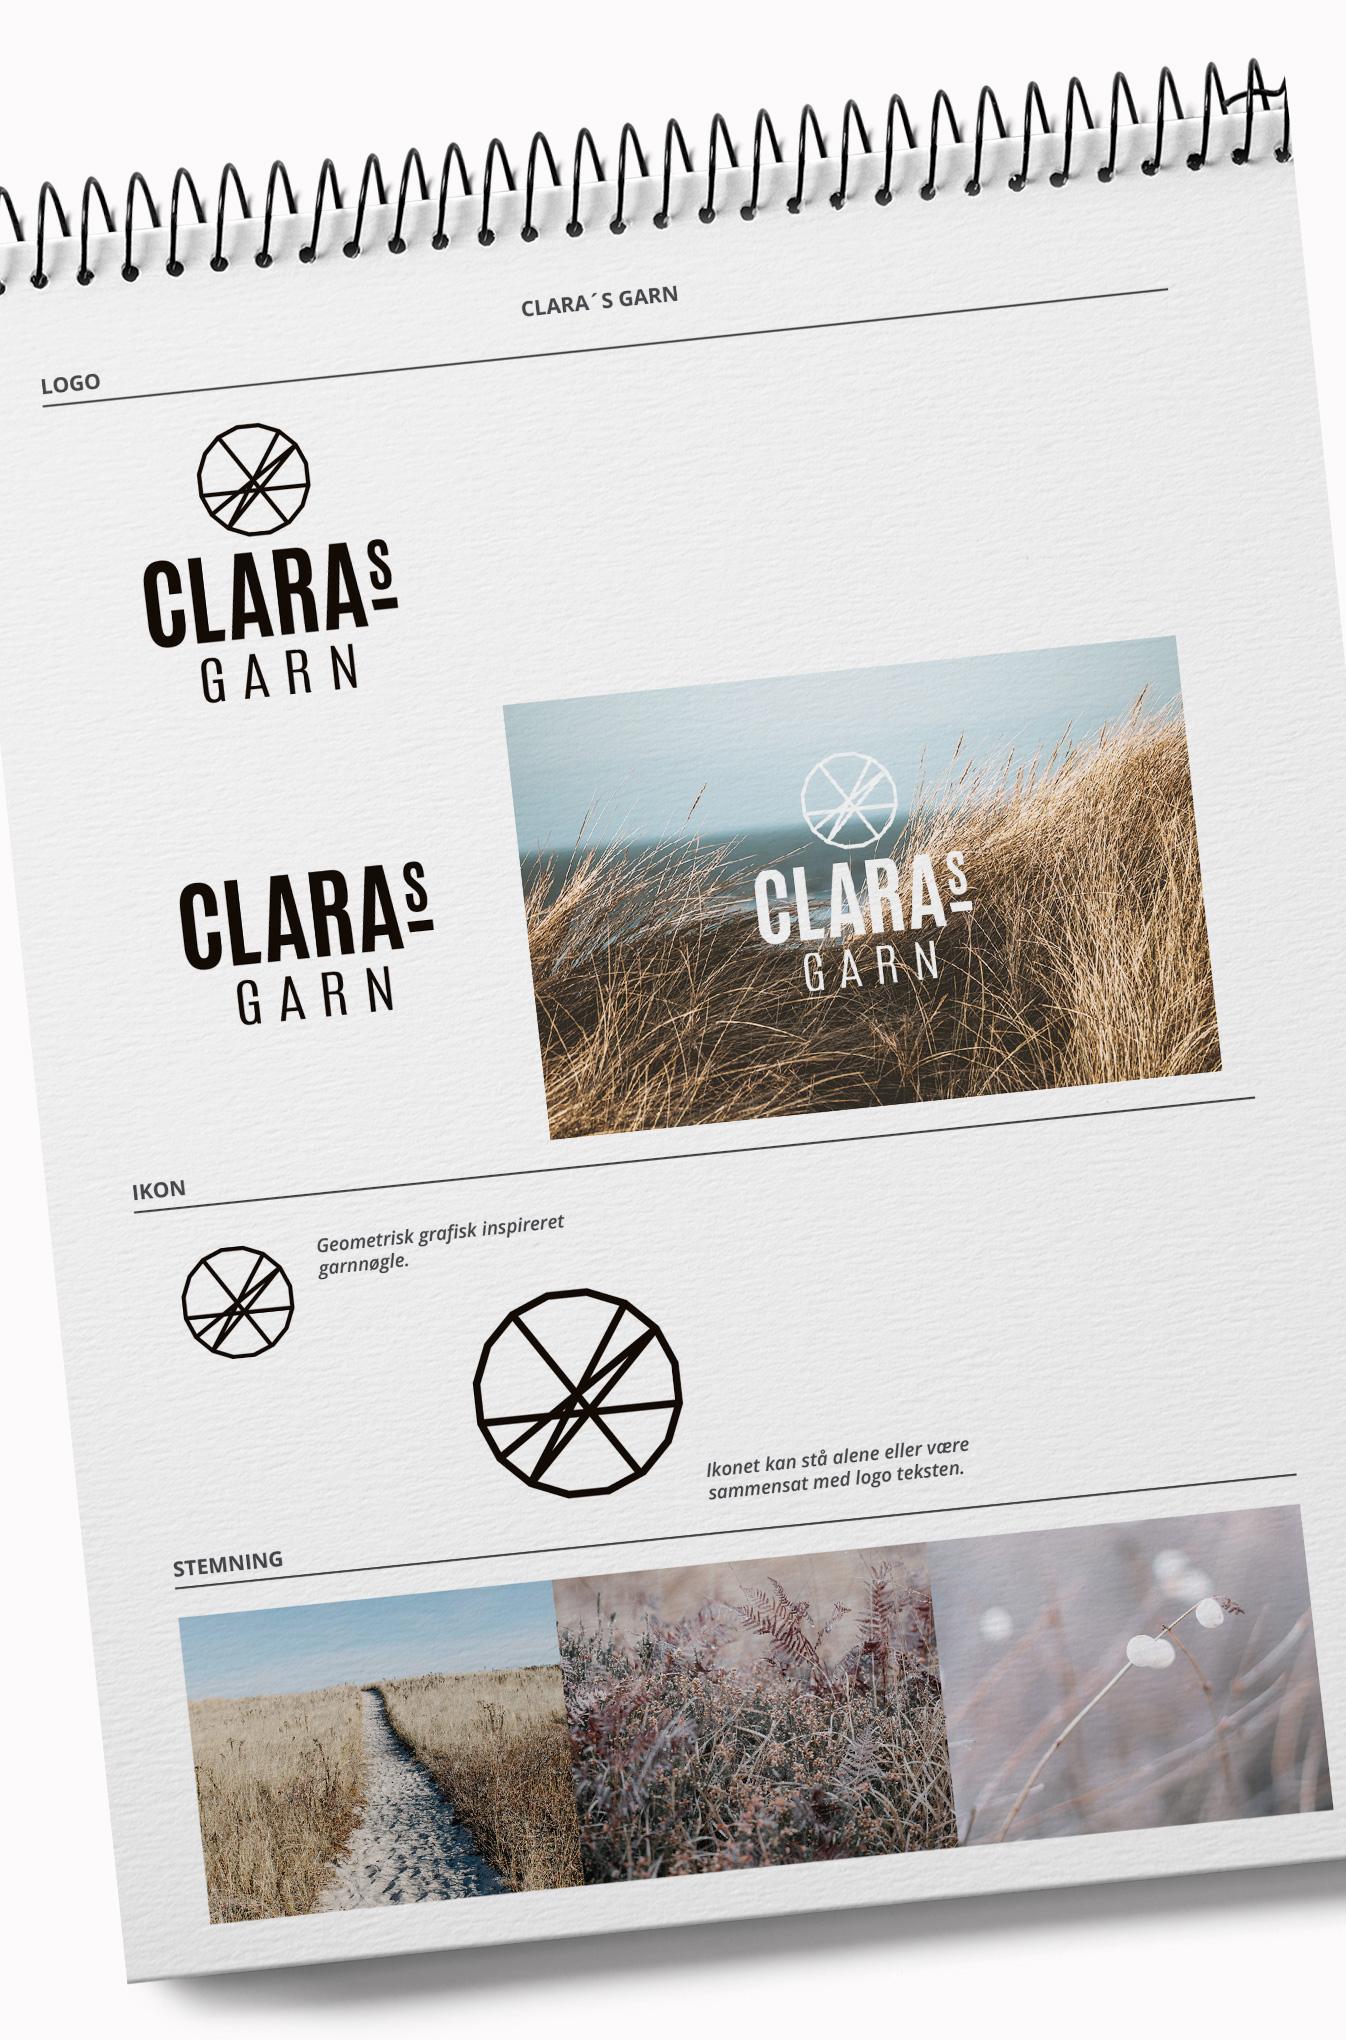 Claras garn branding